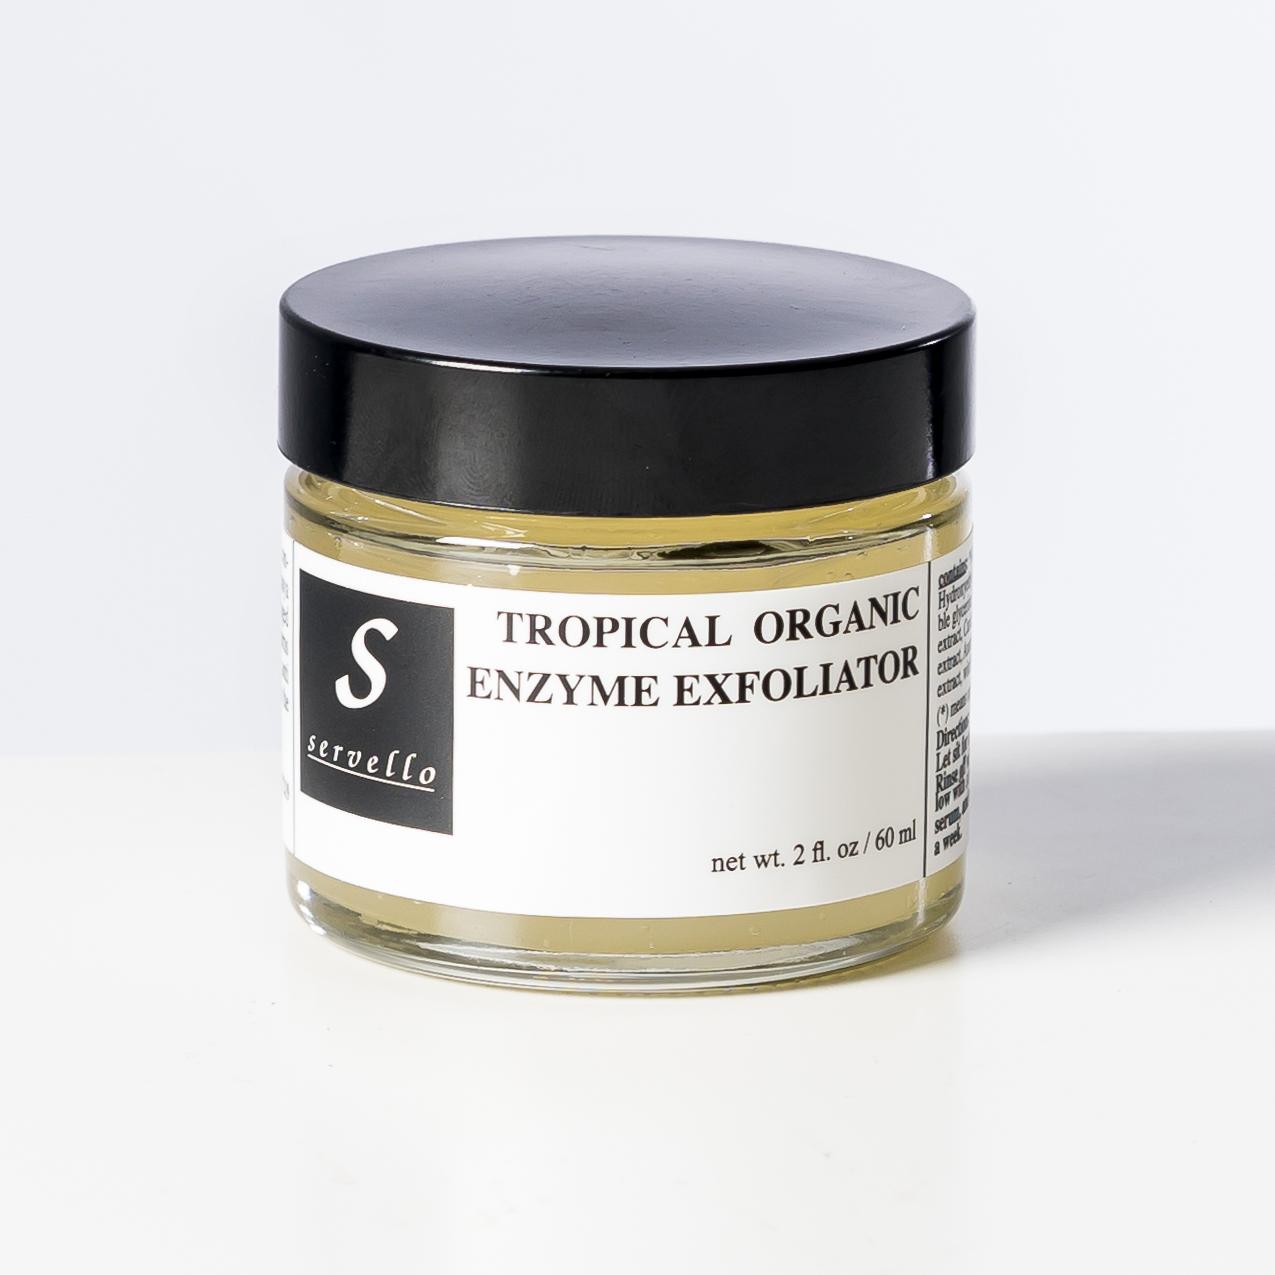 Tropical Enzyme Exfoliator